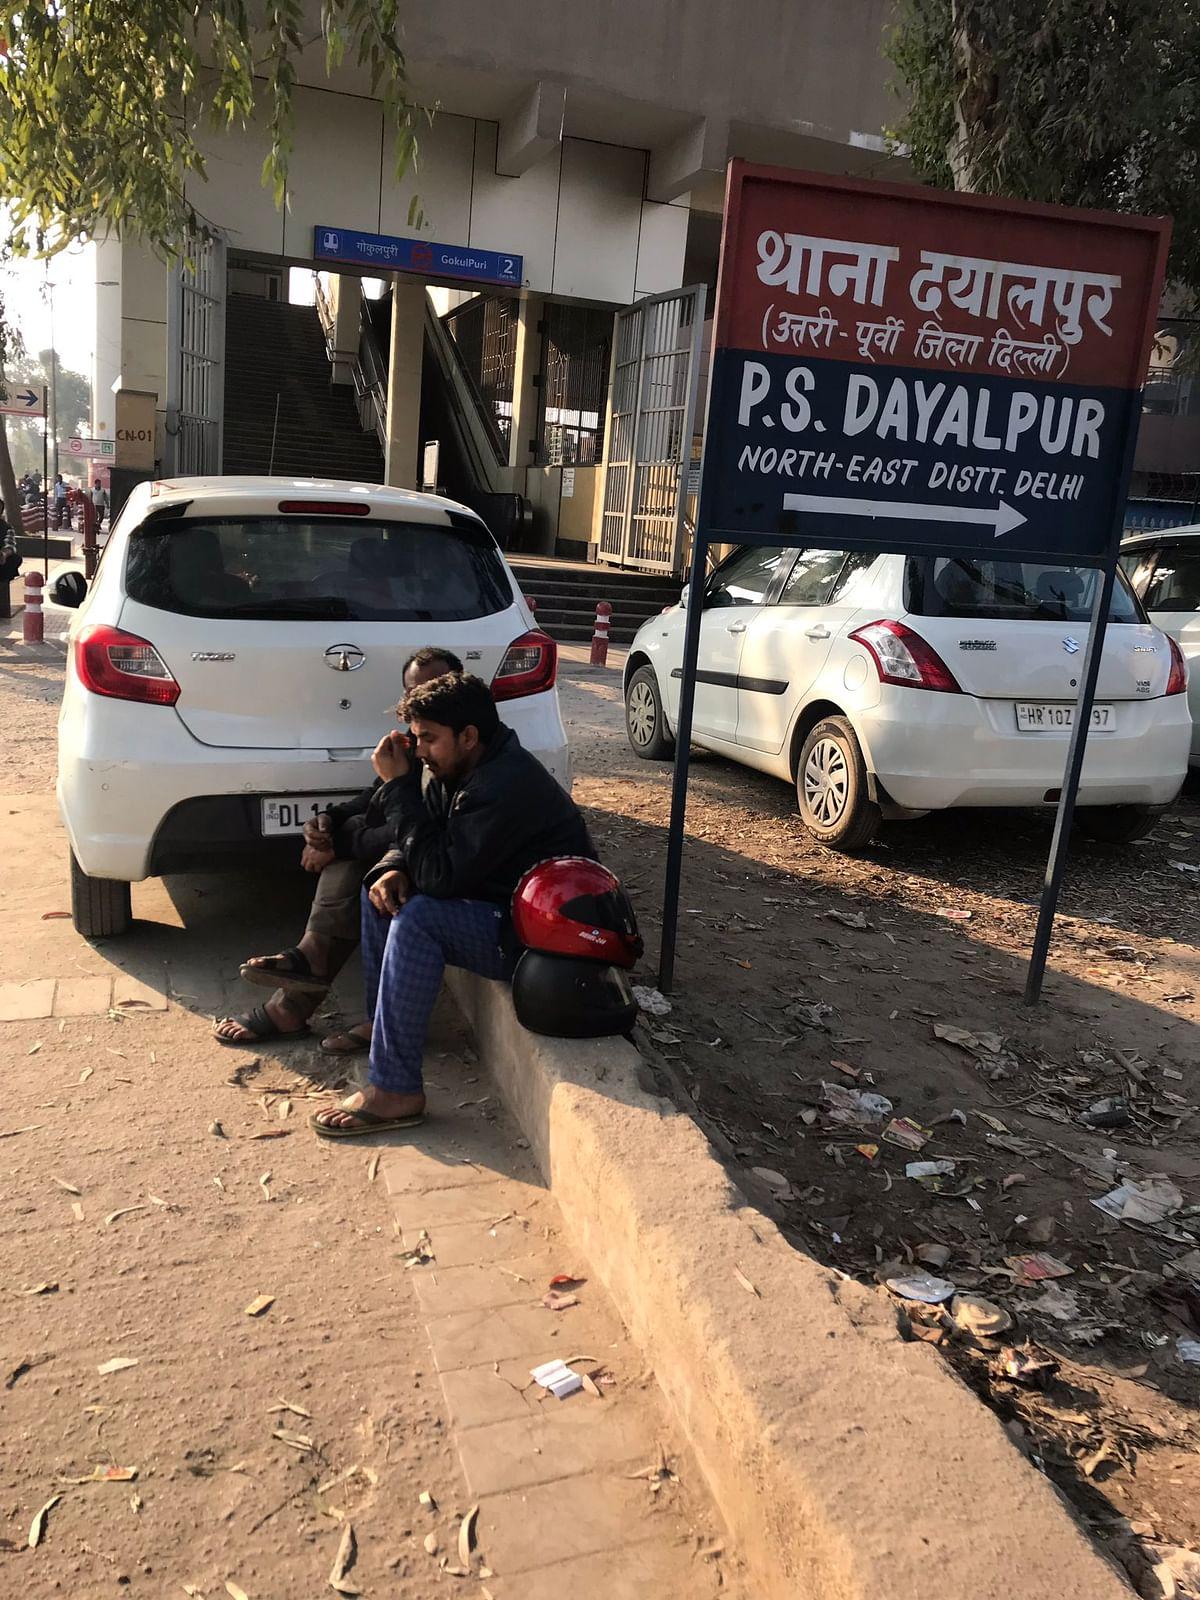 Dayalpur police station.